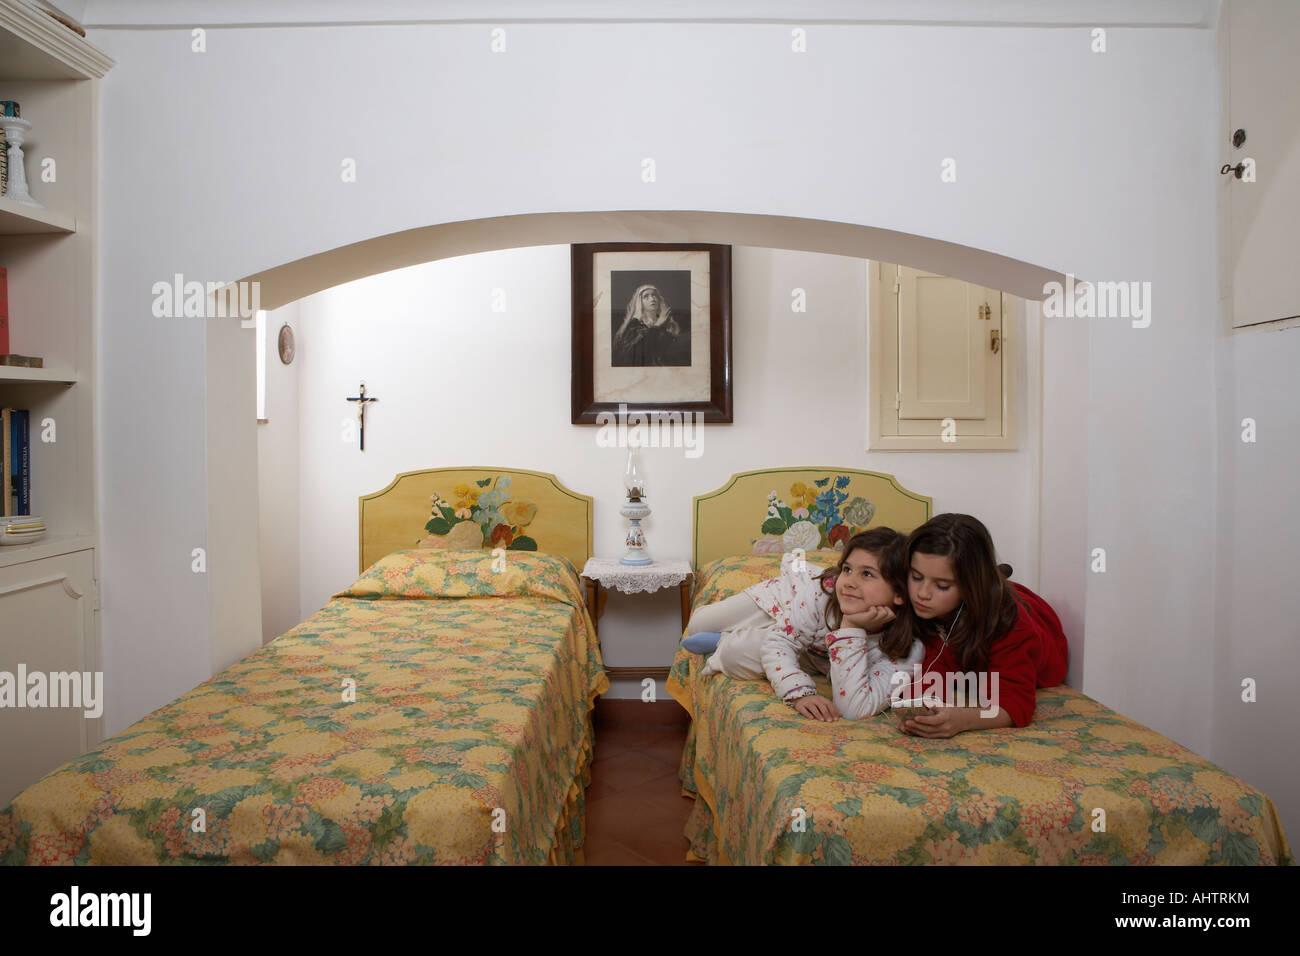 italians relaxing stockfotos italians relaxing bilder seite 2 alamy. Black Bedroom Furniture Sets. Home Design Ideas